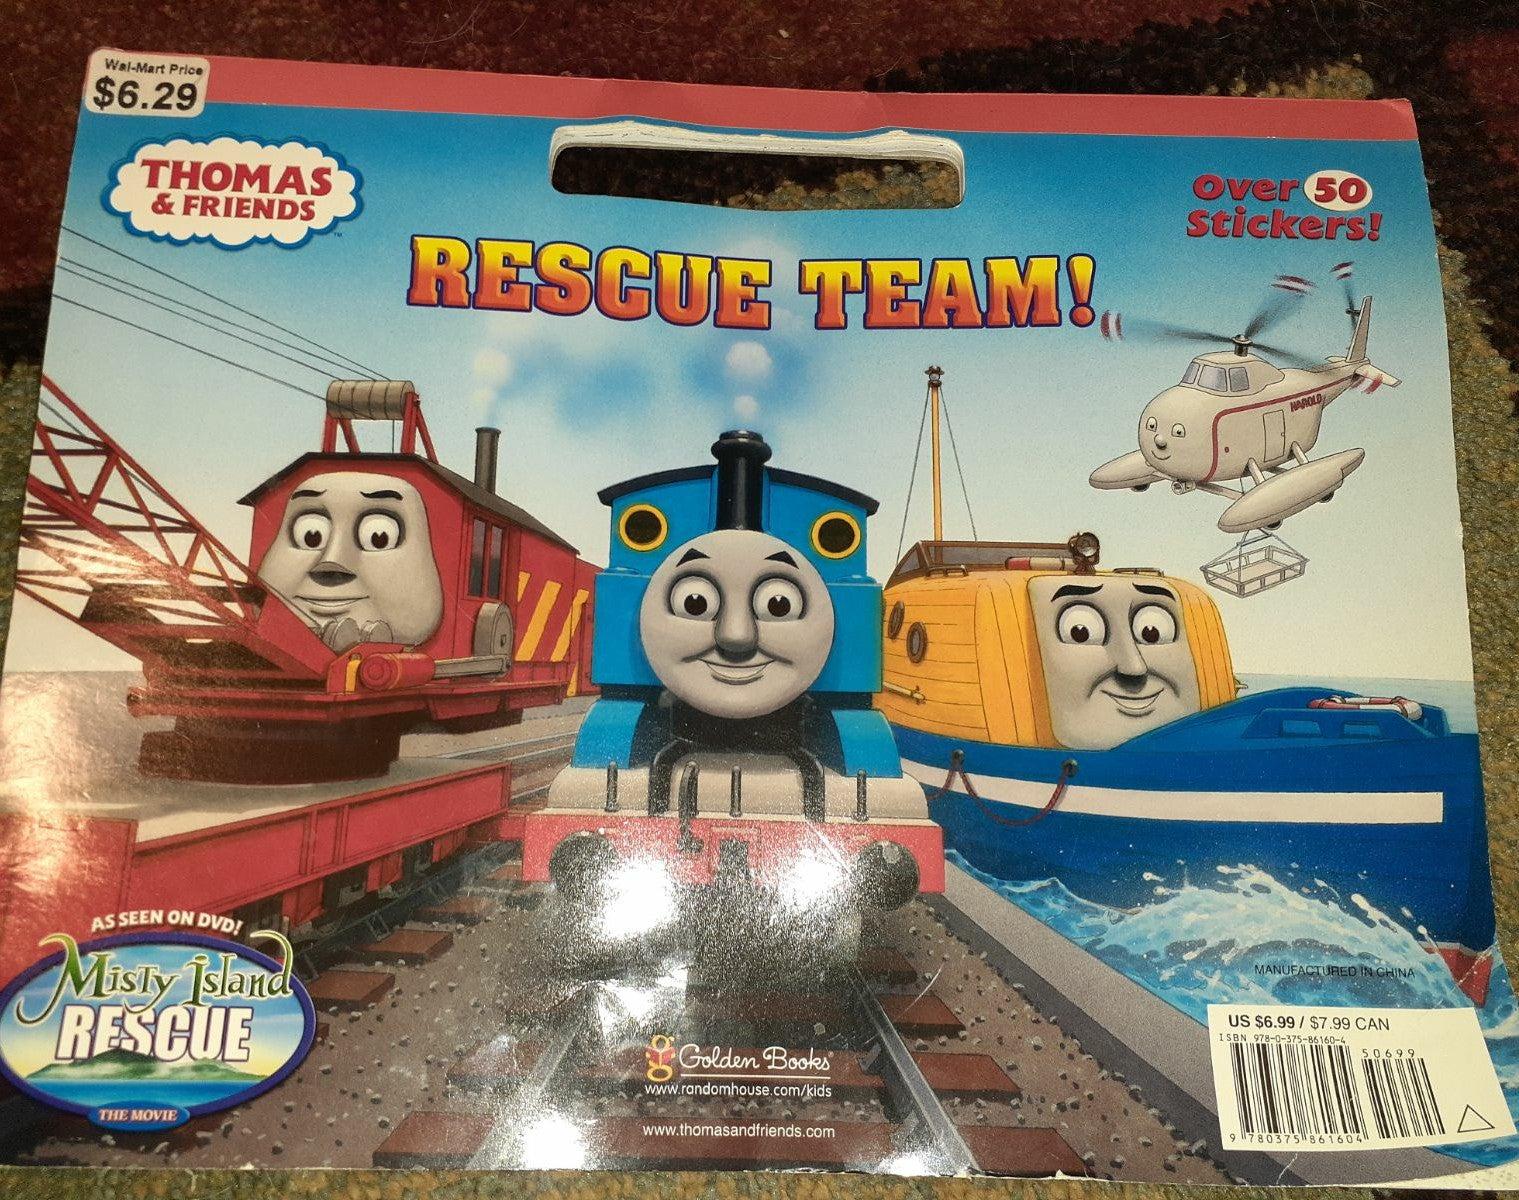 Thomas the train misty island book color